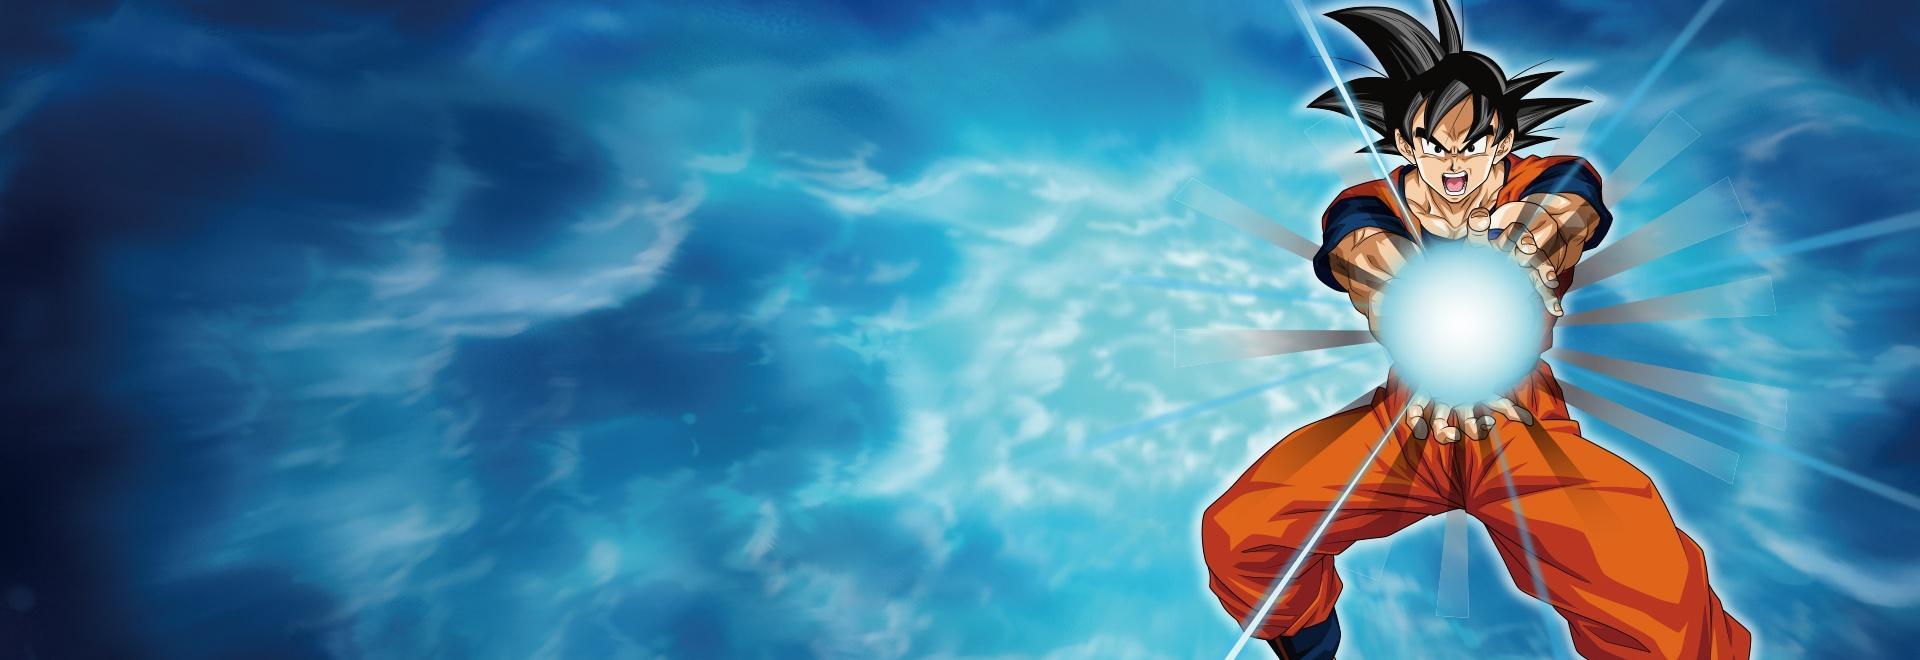 Goku combatte finalmente contro Monaka?